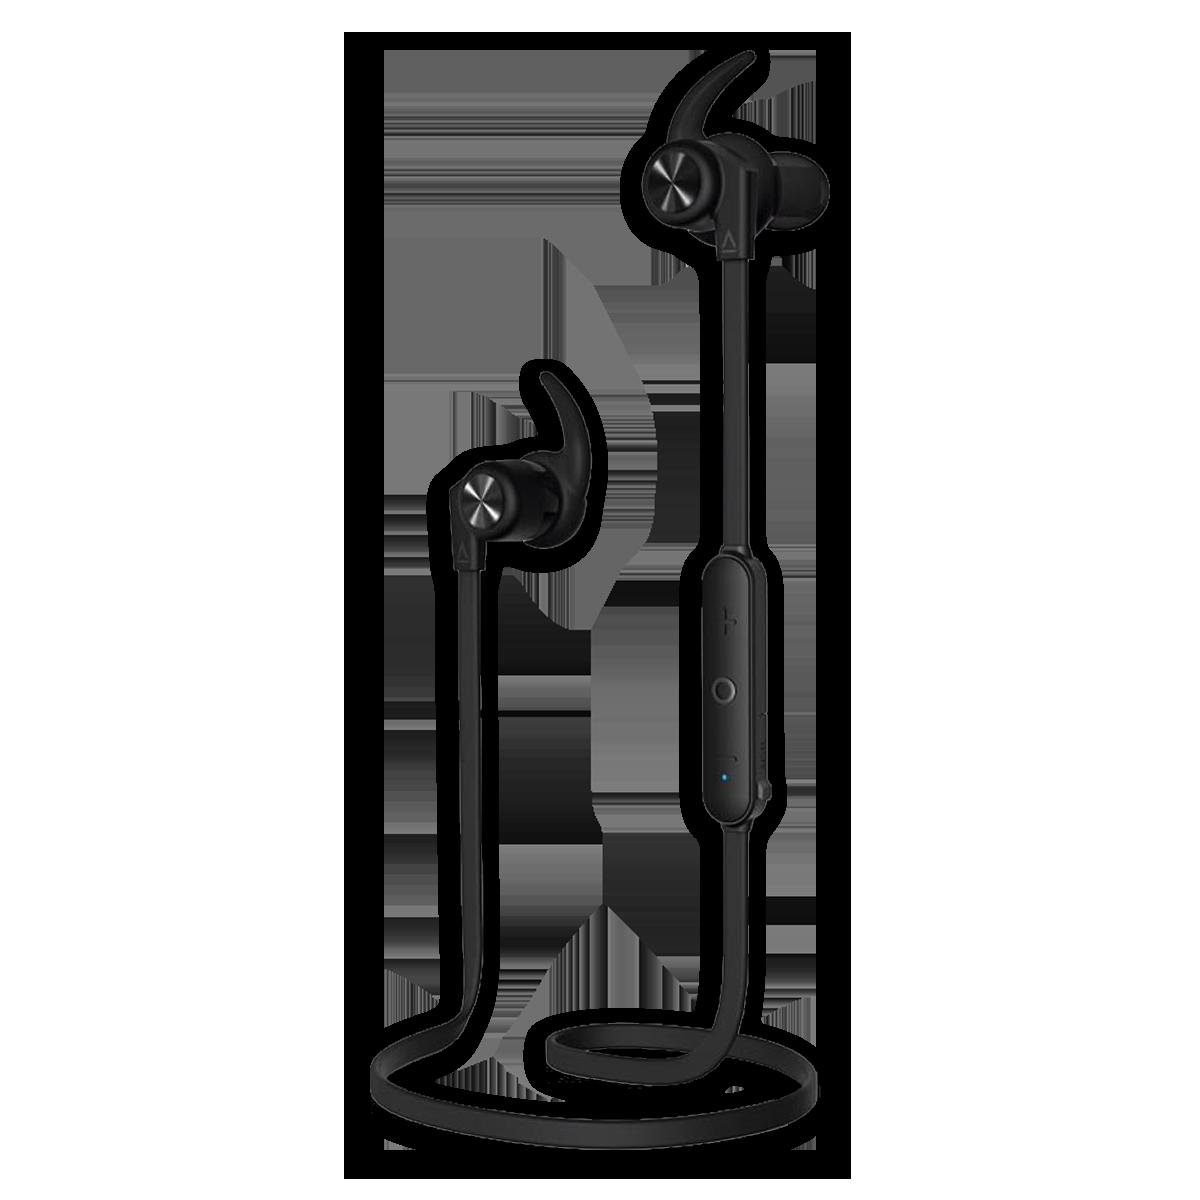 Creative Outlier ONE Waterproof Headphones